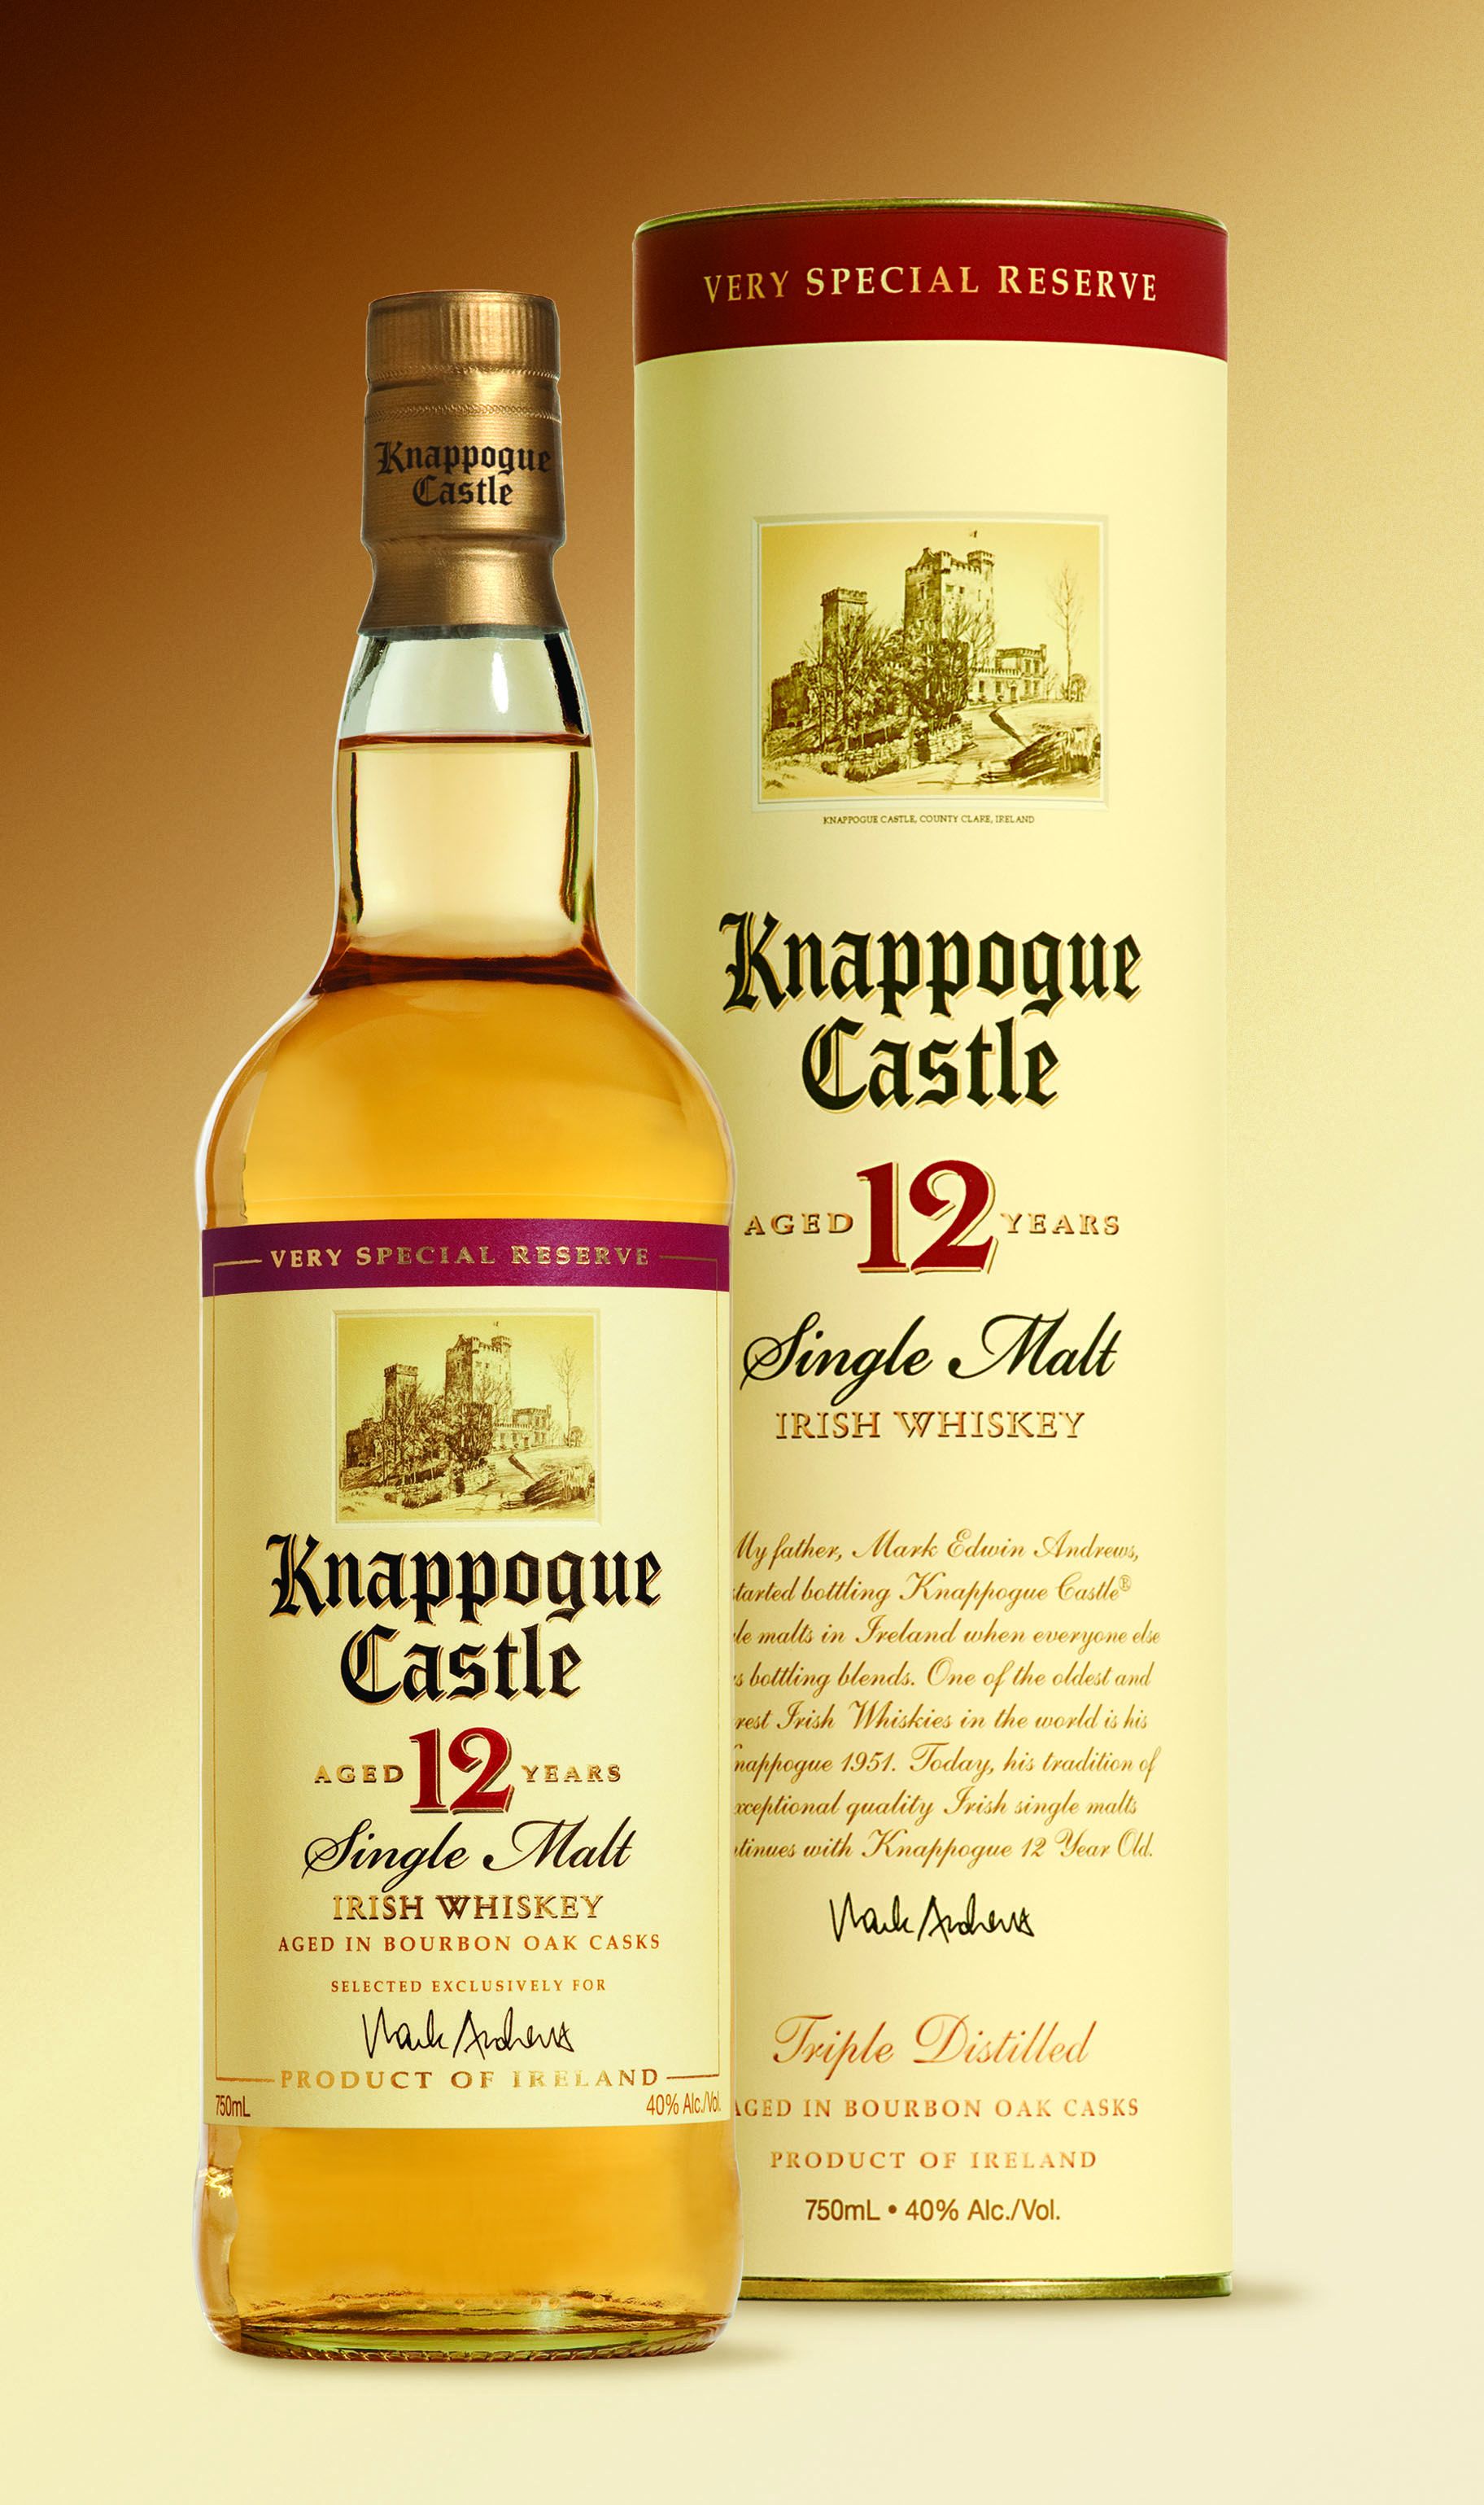 Knappogue Castle Single Malt Irish Whiskey Knappogue Castle  # Muebles Para Guardar Whisky